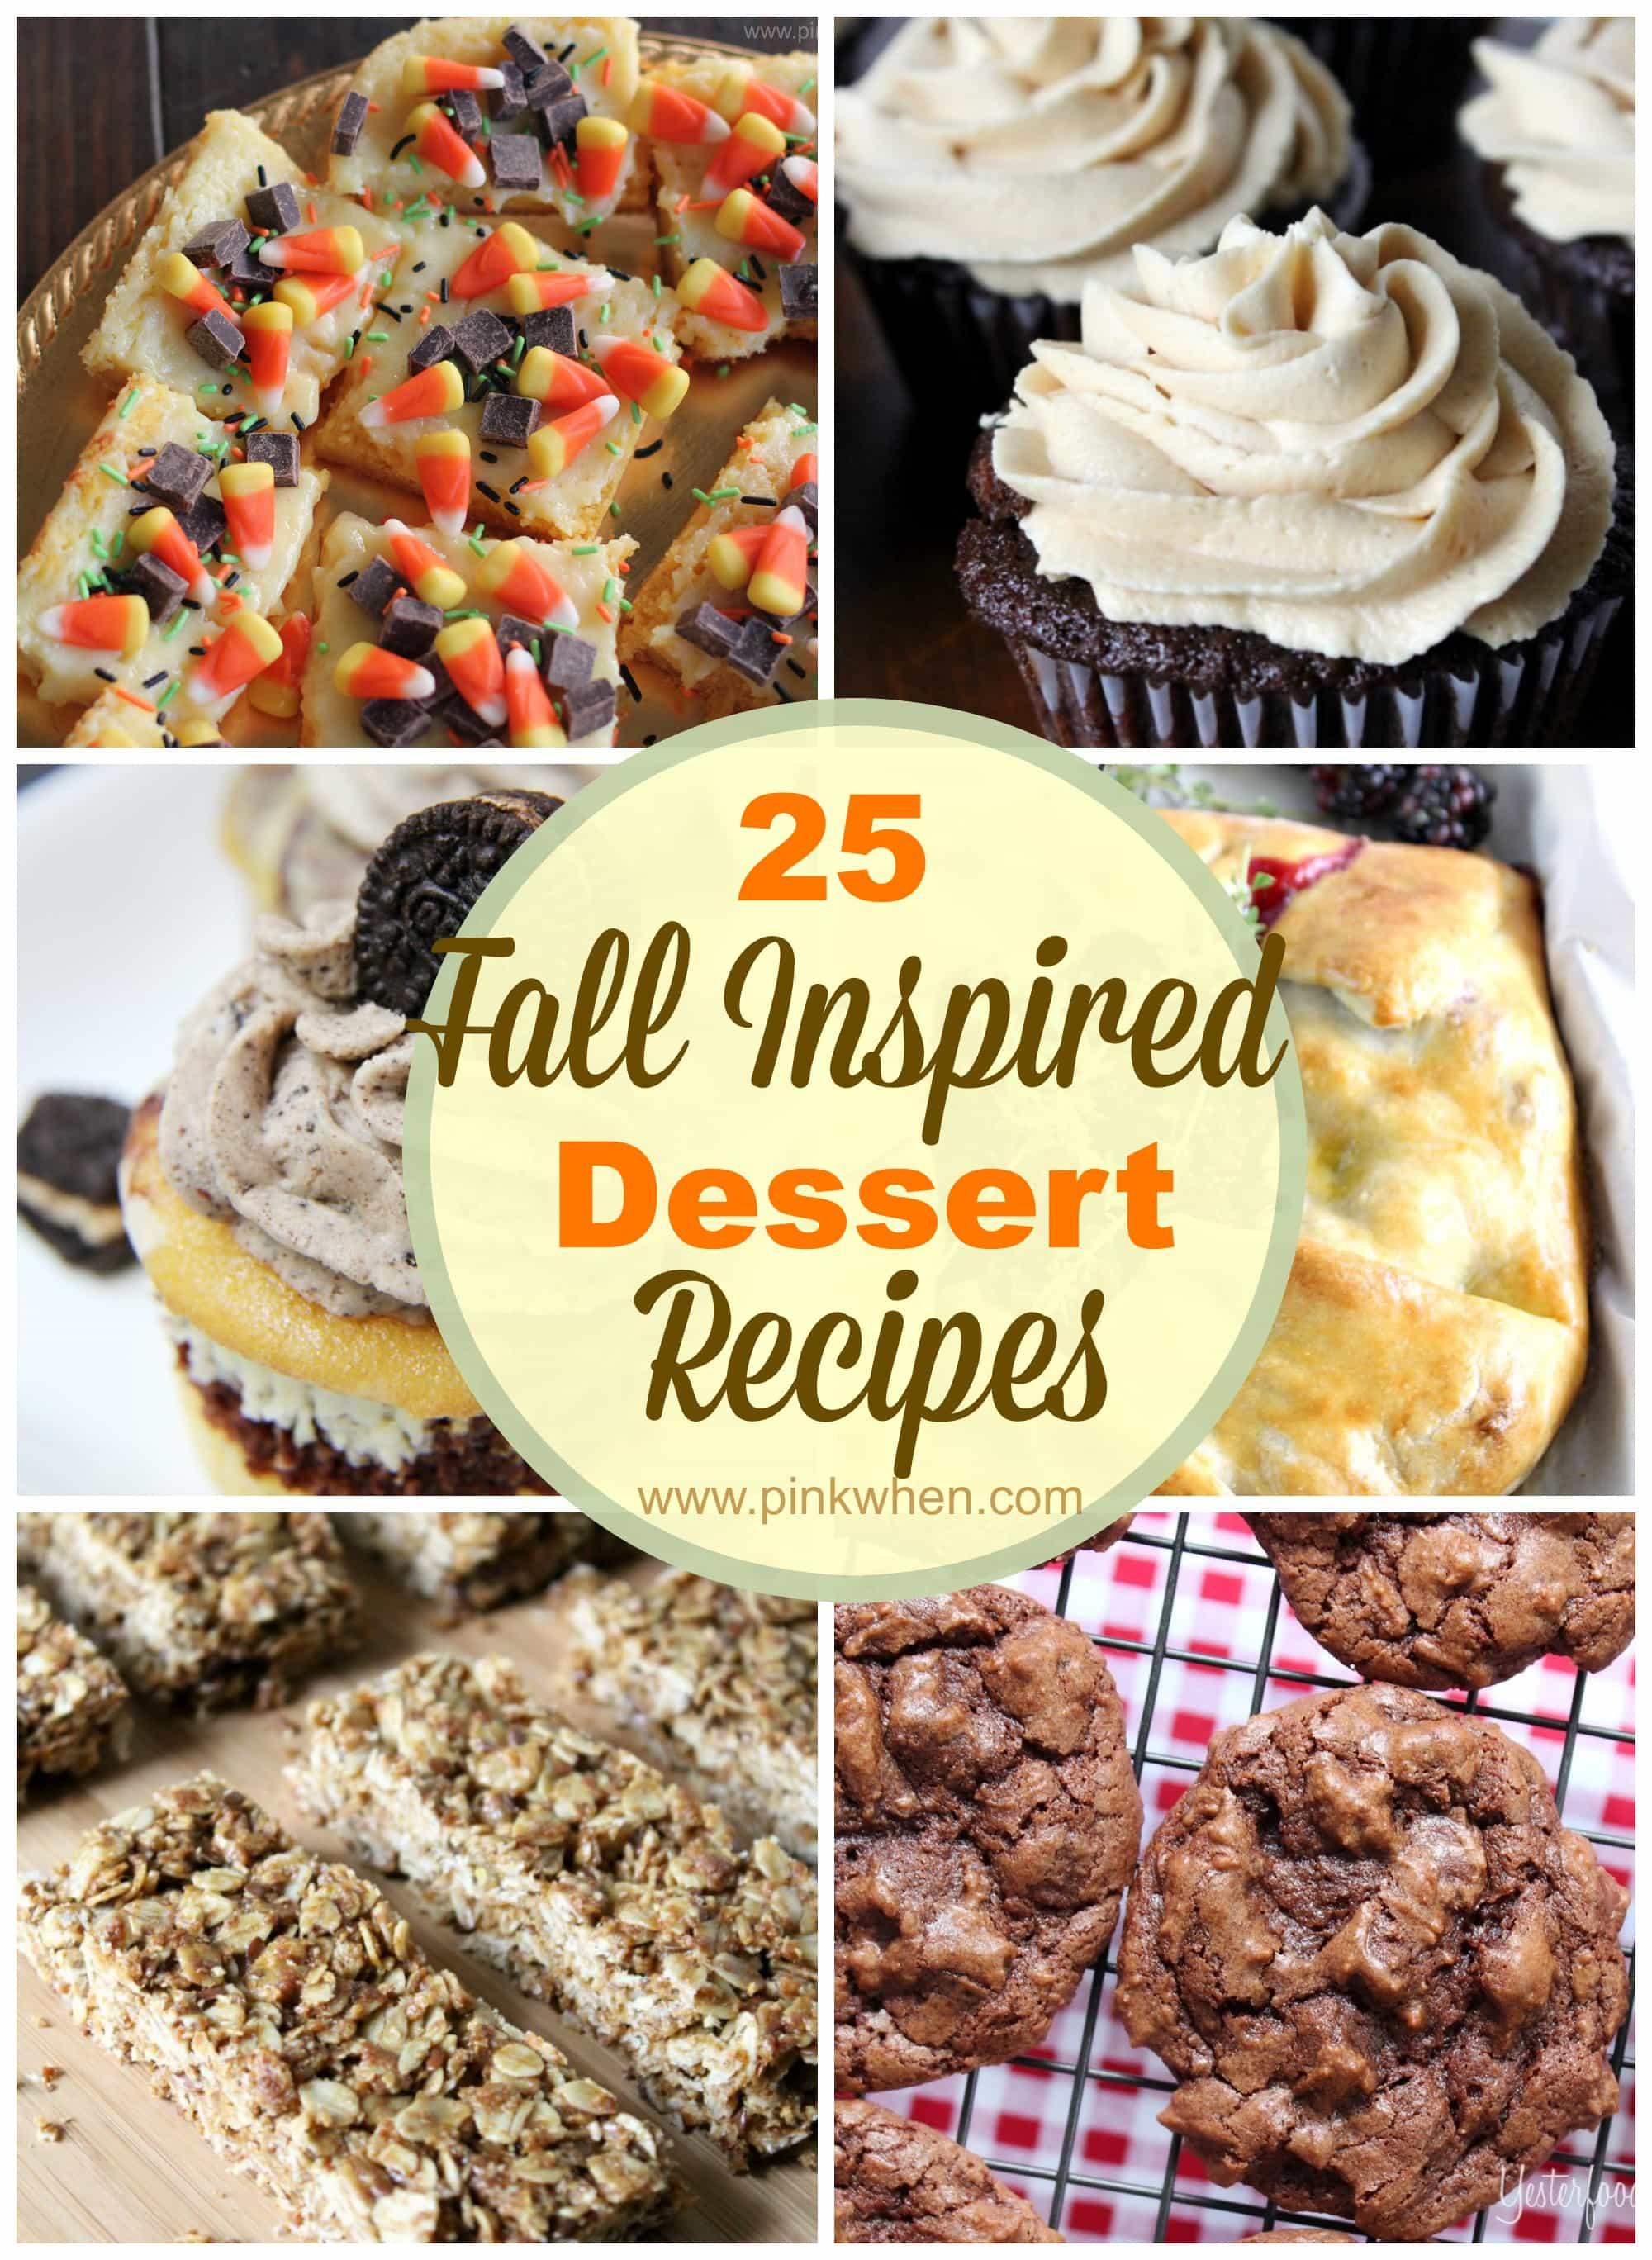 Fall Dessert Recipes  diy Sunday Showcase 9 27 & FAVS PinkWhen